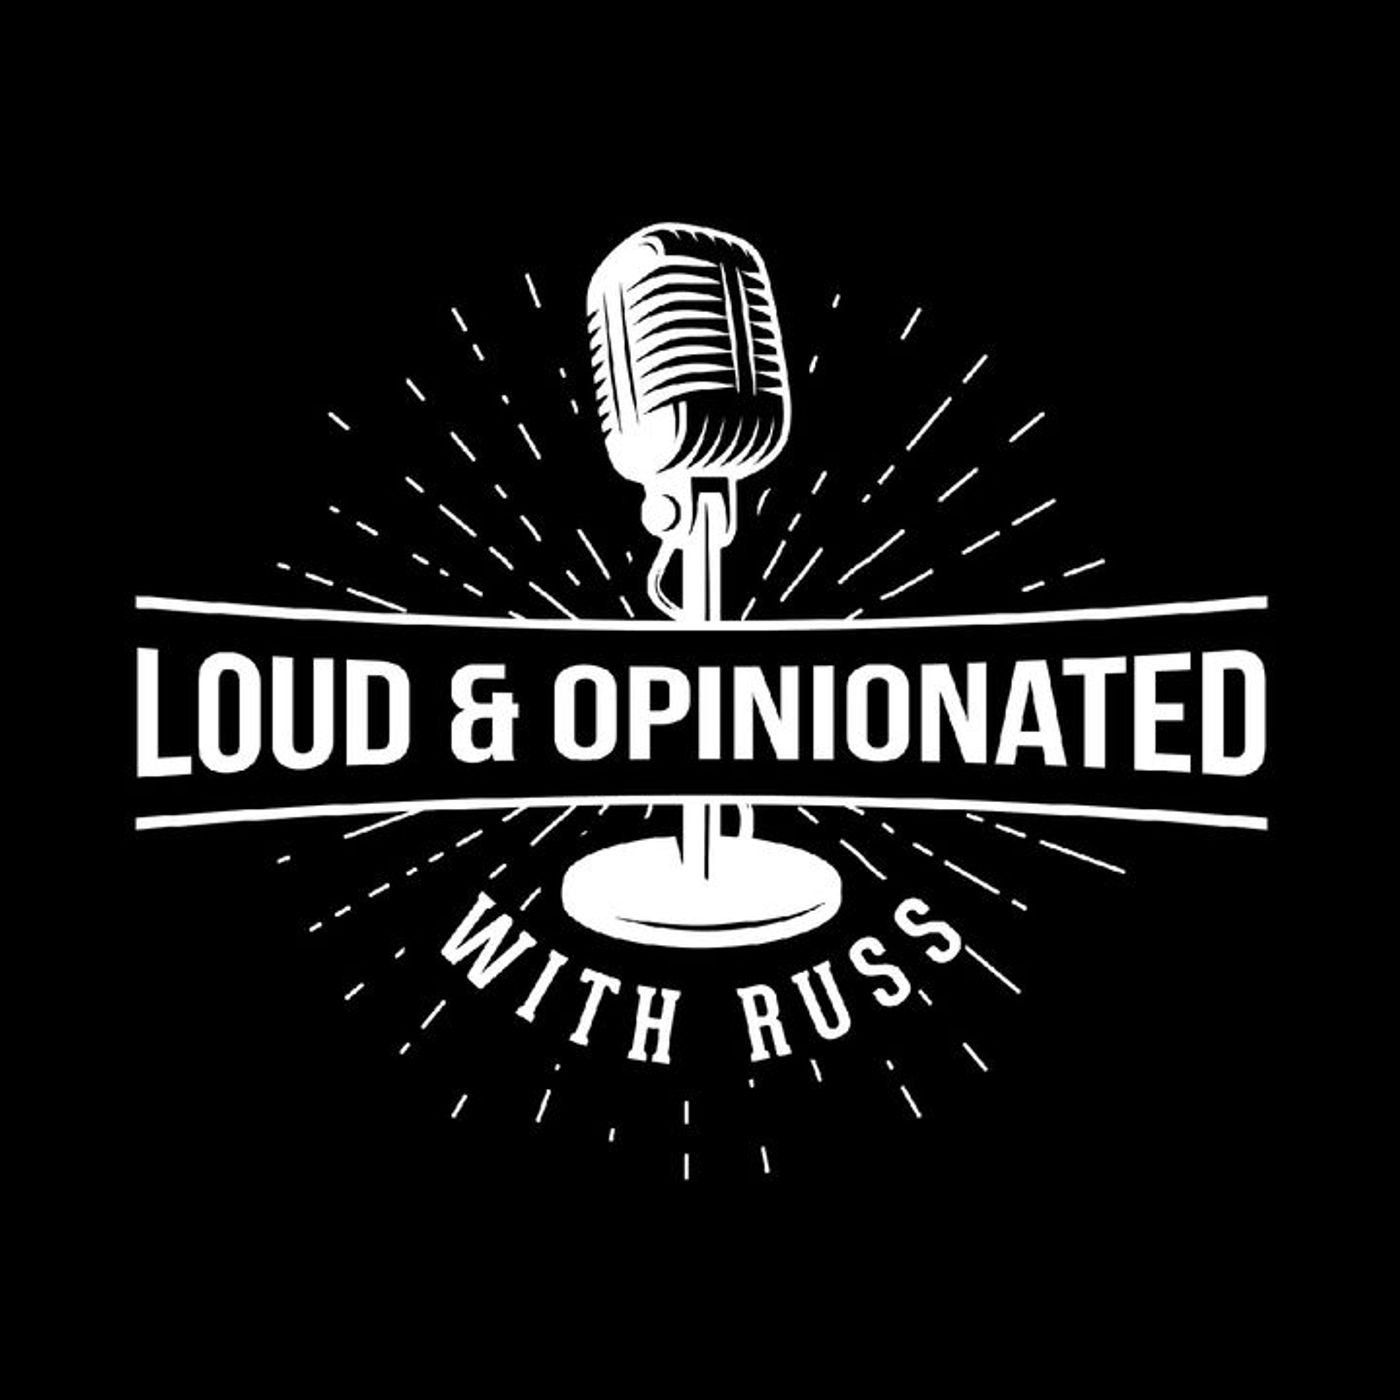 Loud & Opinionated